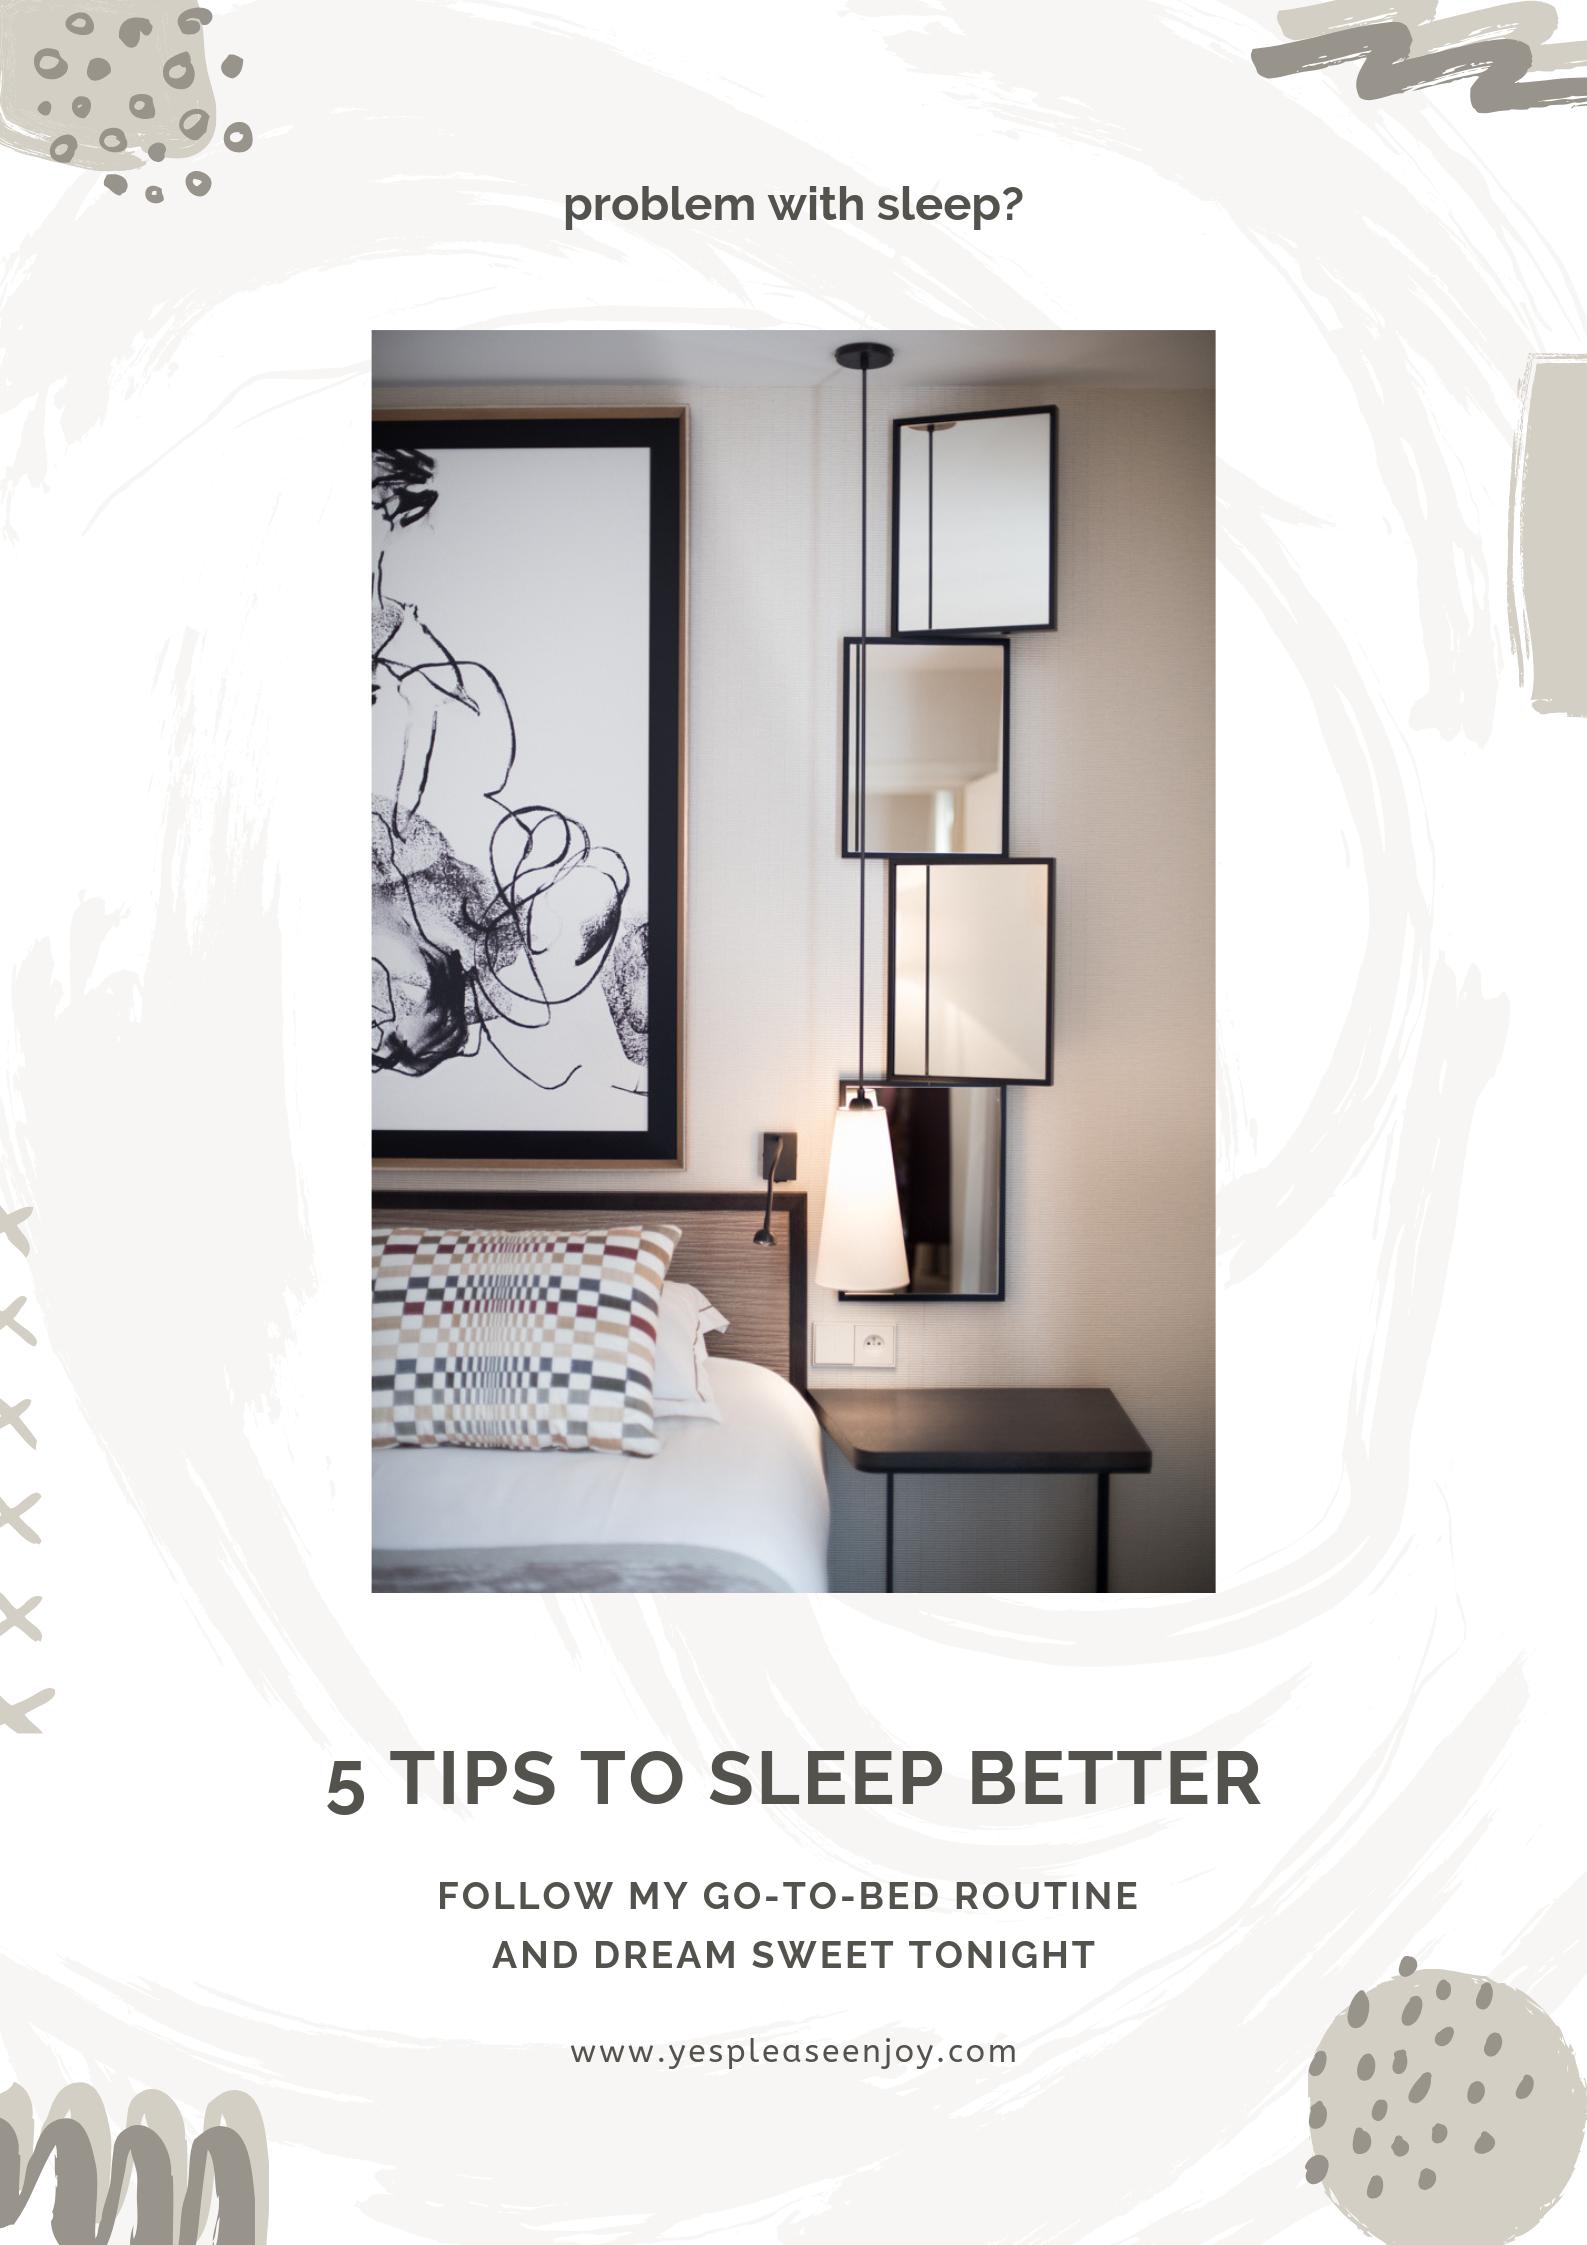 bamford 5 tips to sleep better.png